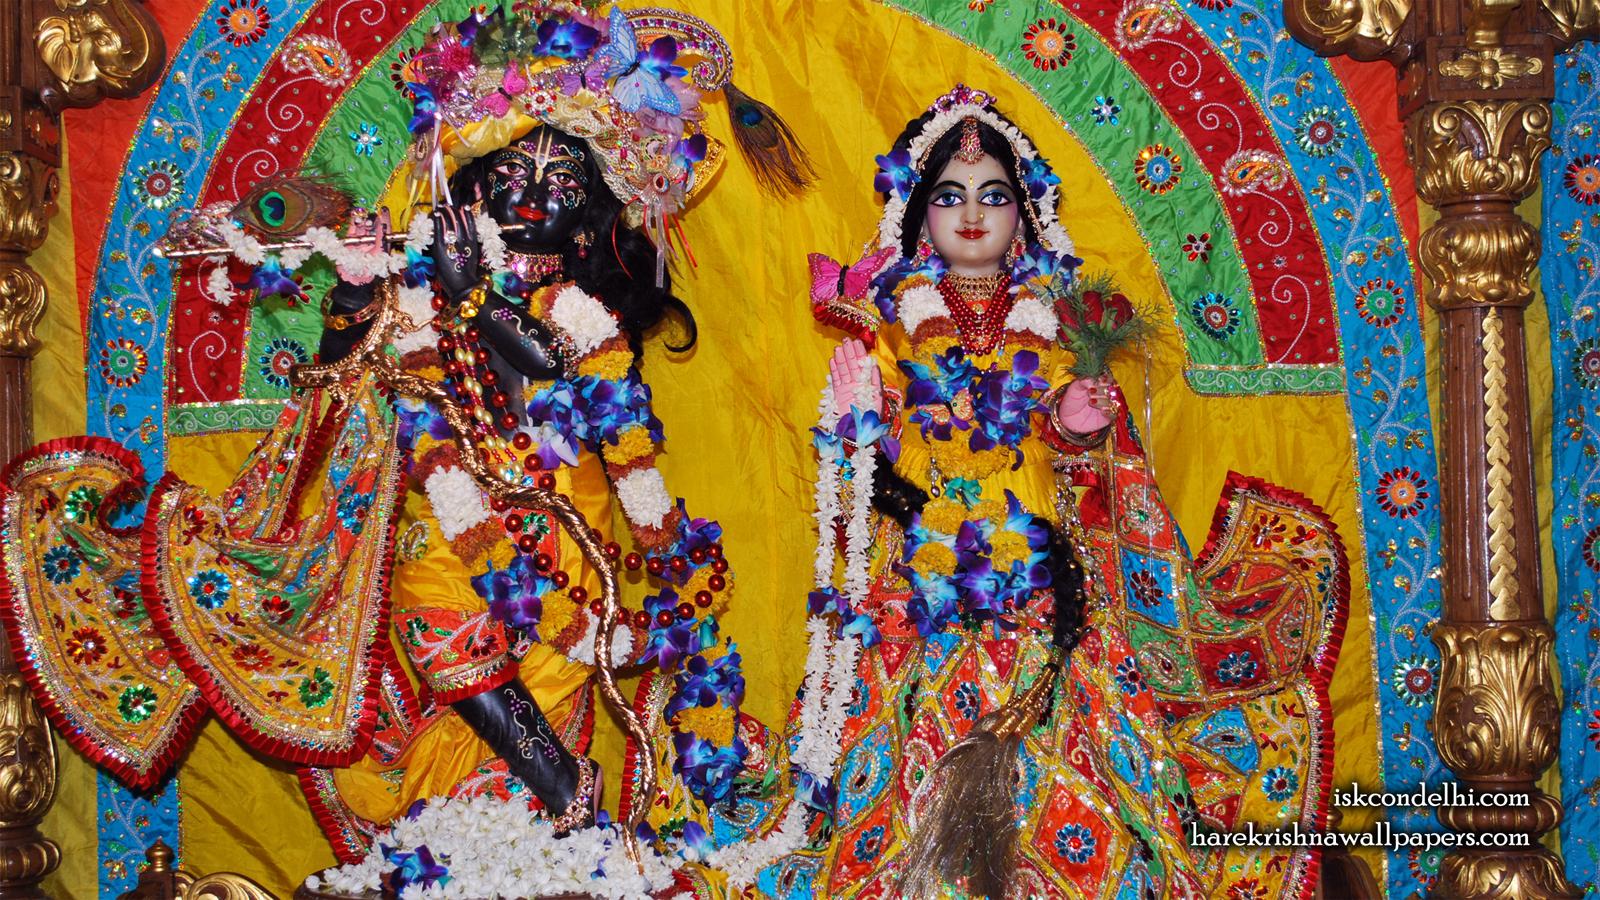 Sri Sri Radha Parthasarathi Wallpaper (012) Size 1600x900 Download